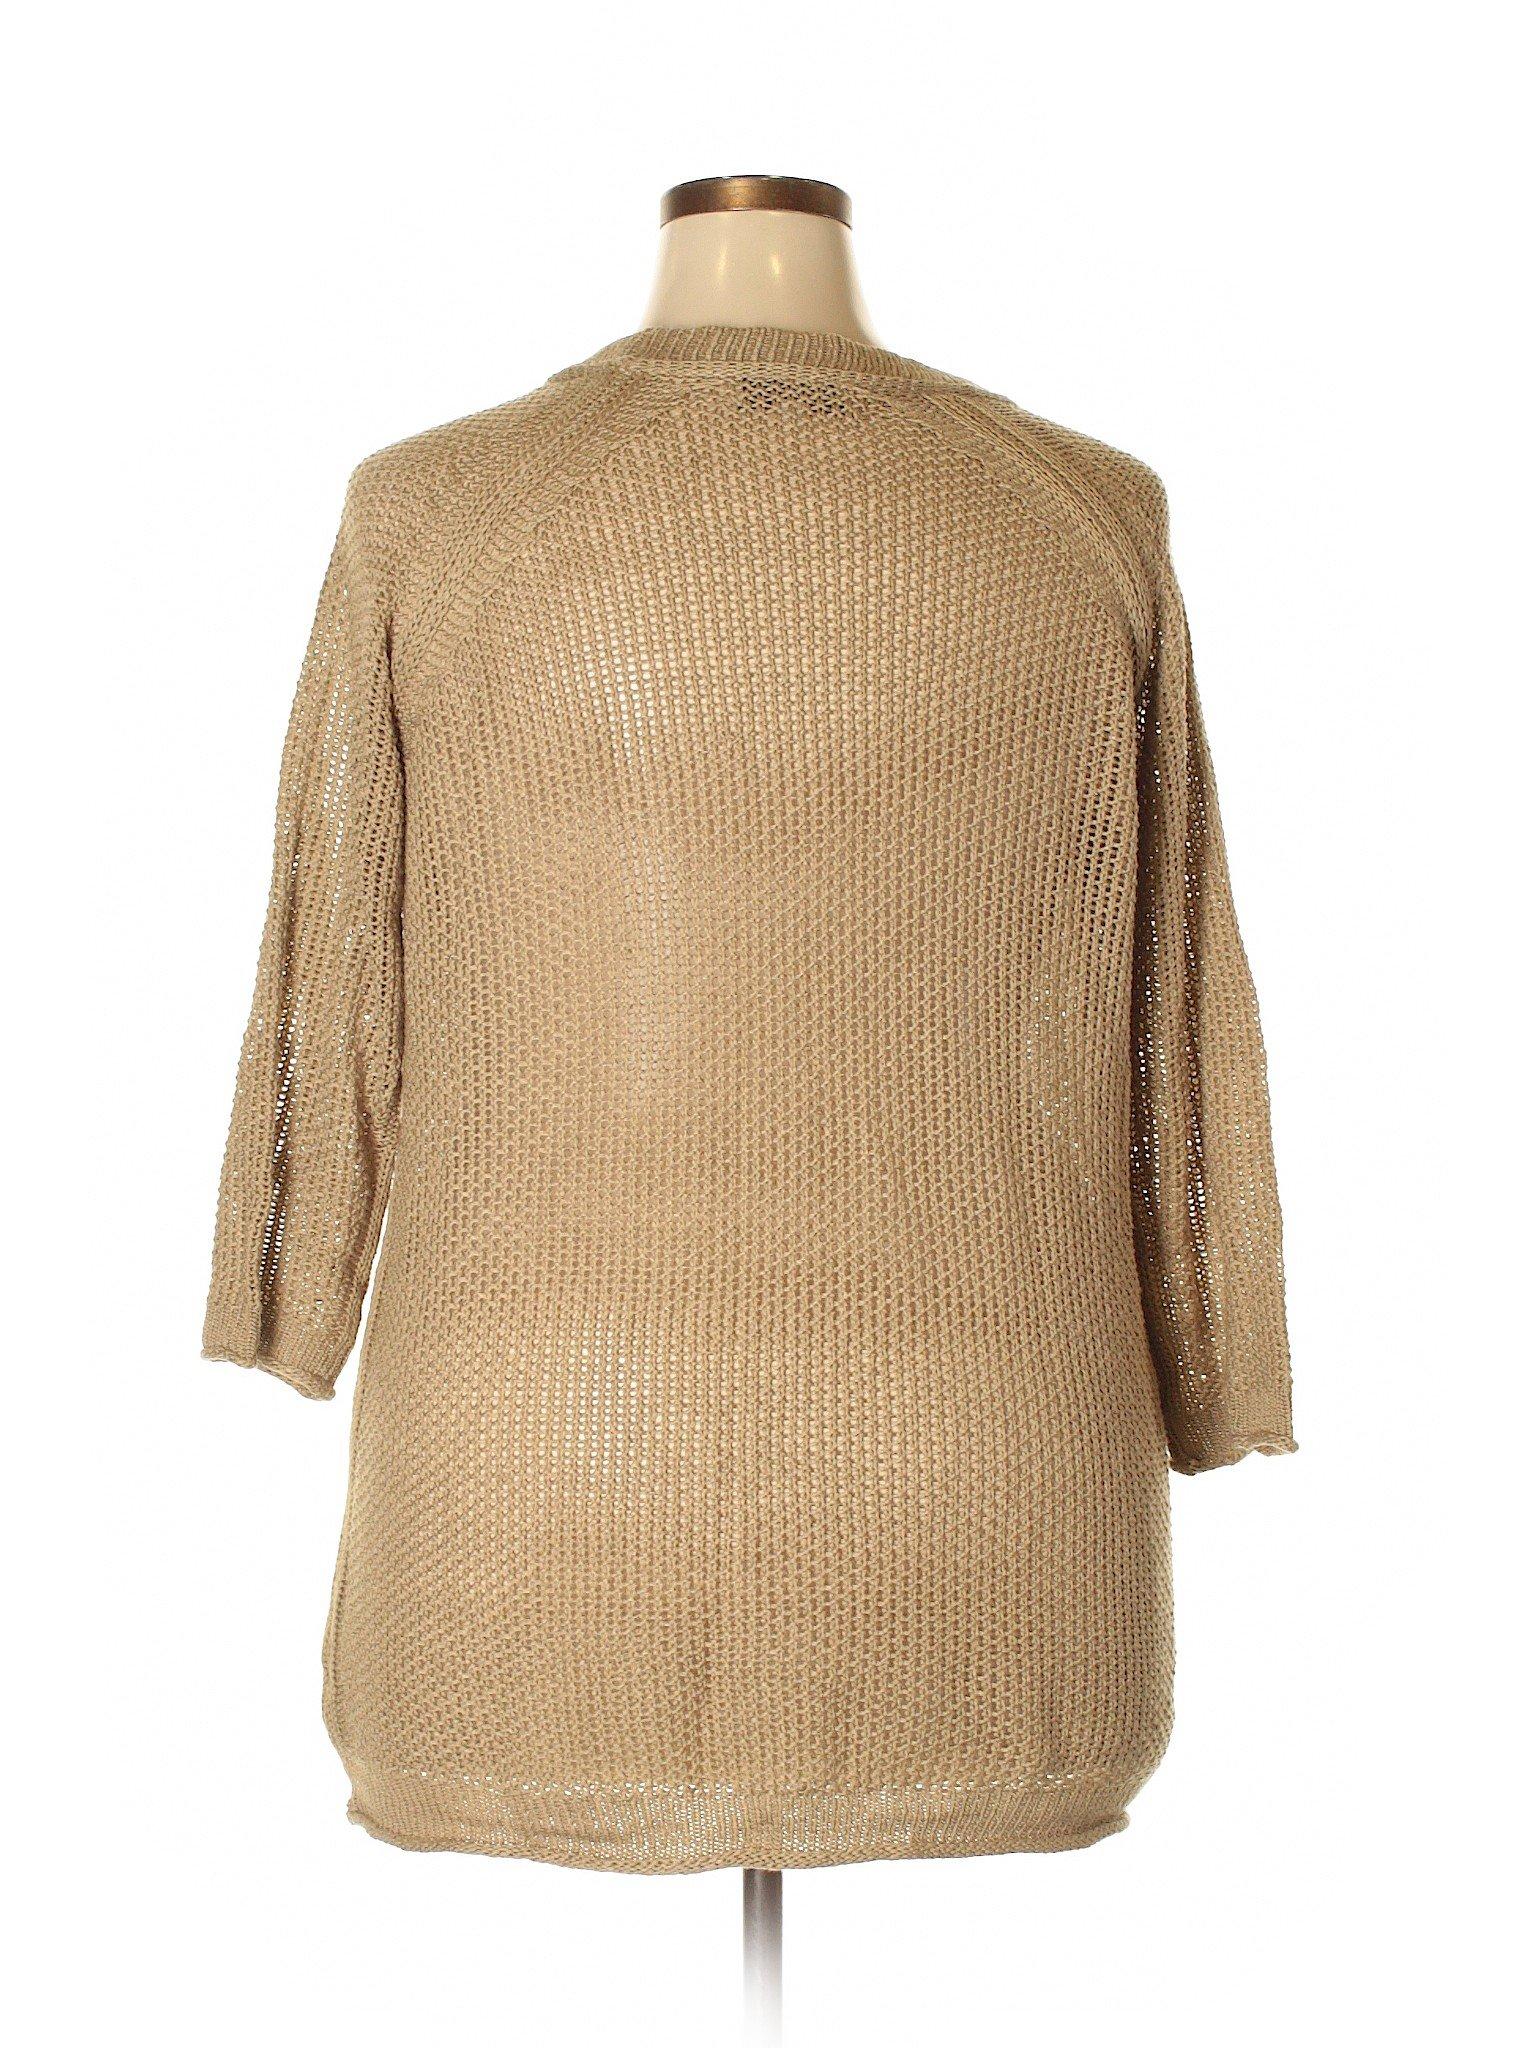 Jones Boutique York New Sweater Pullover qUdXfdw